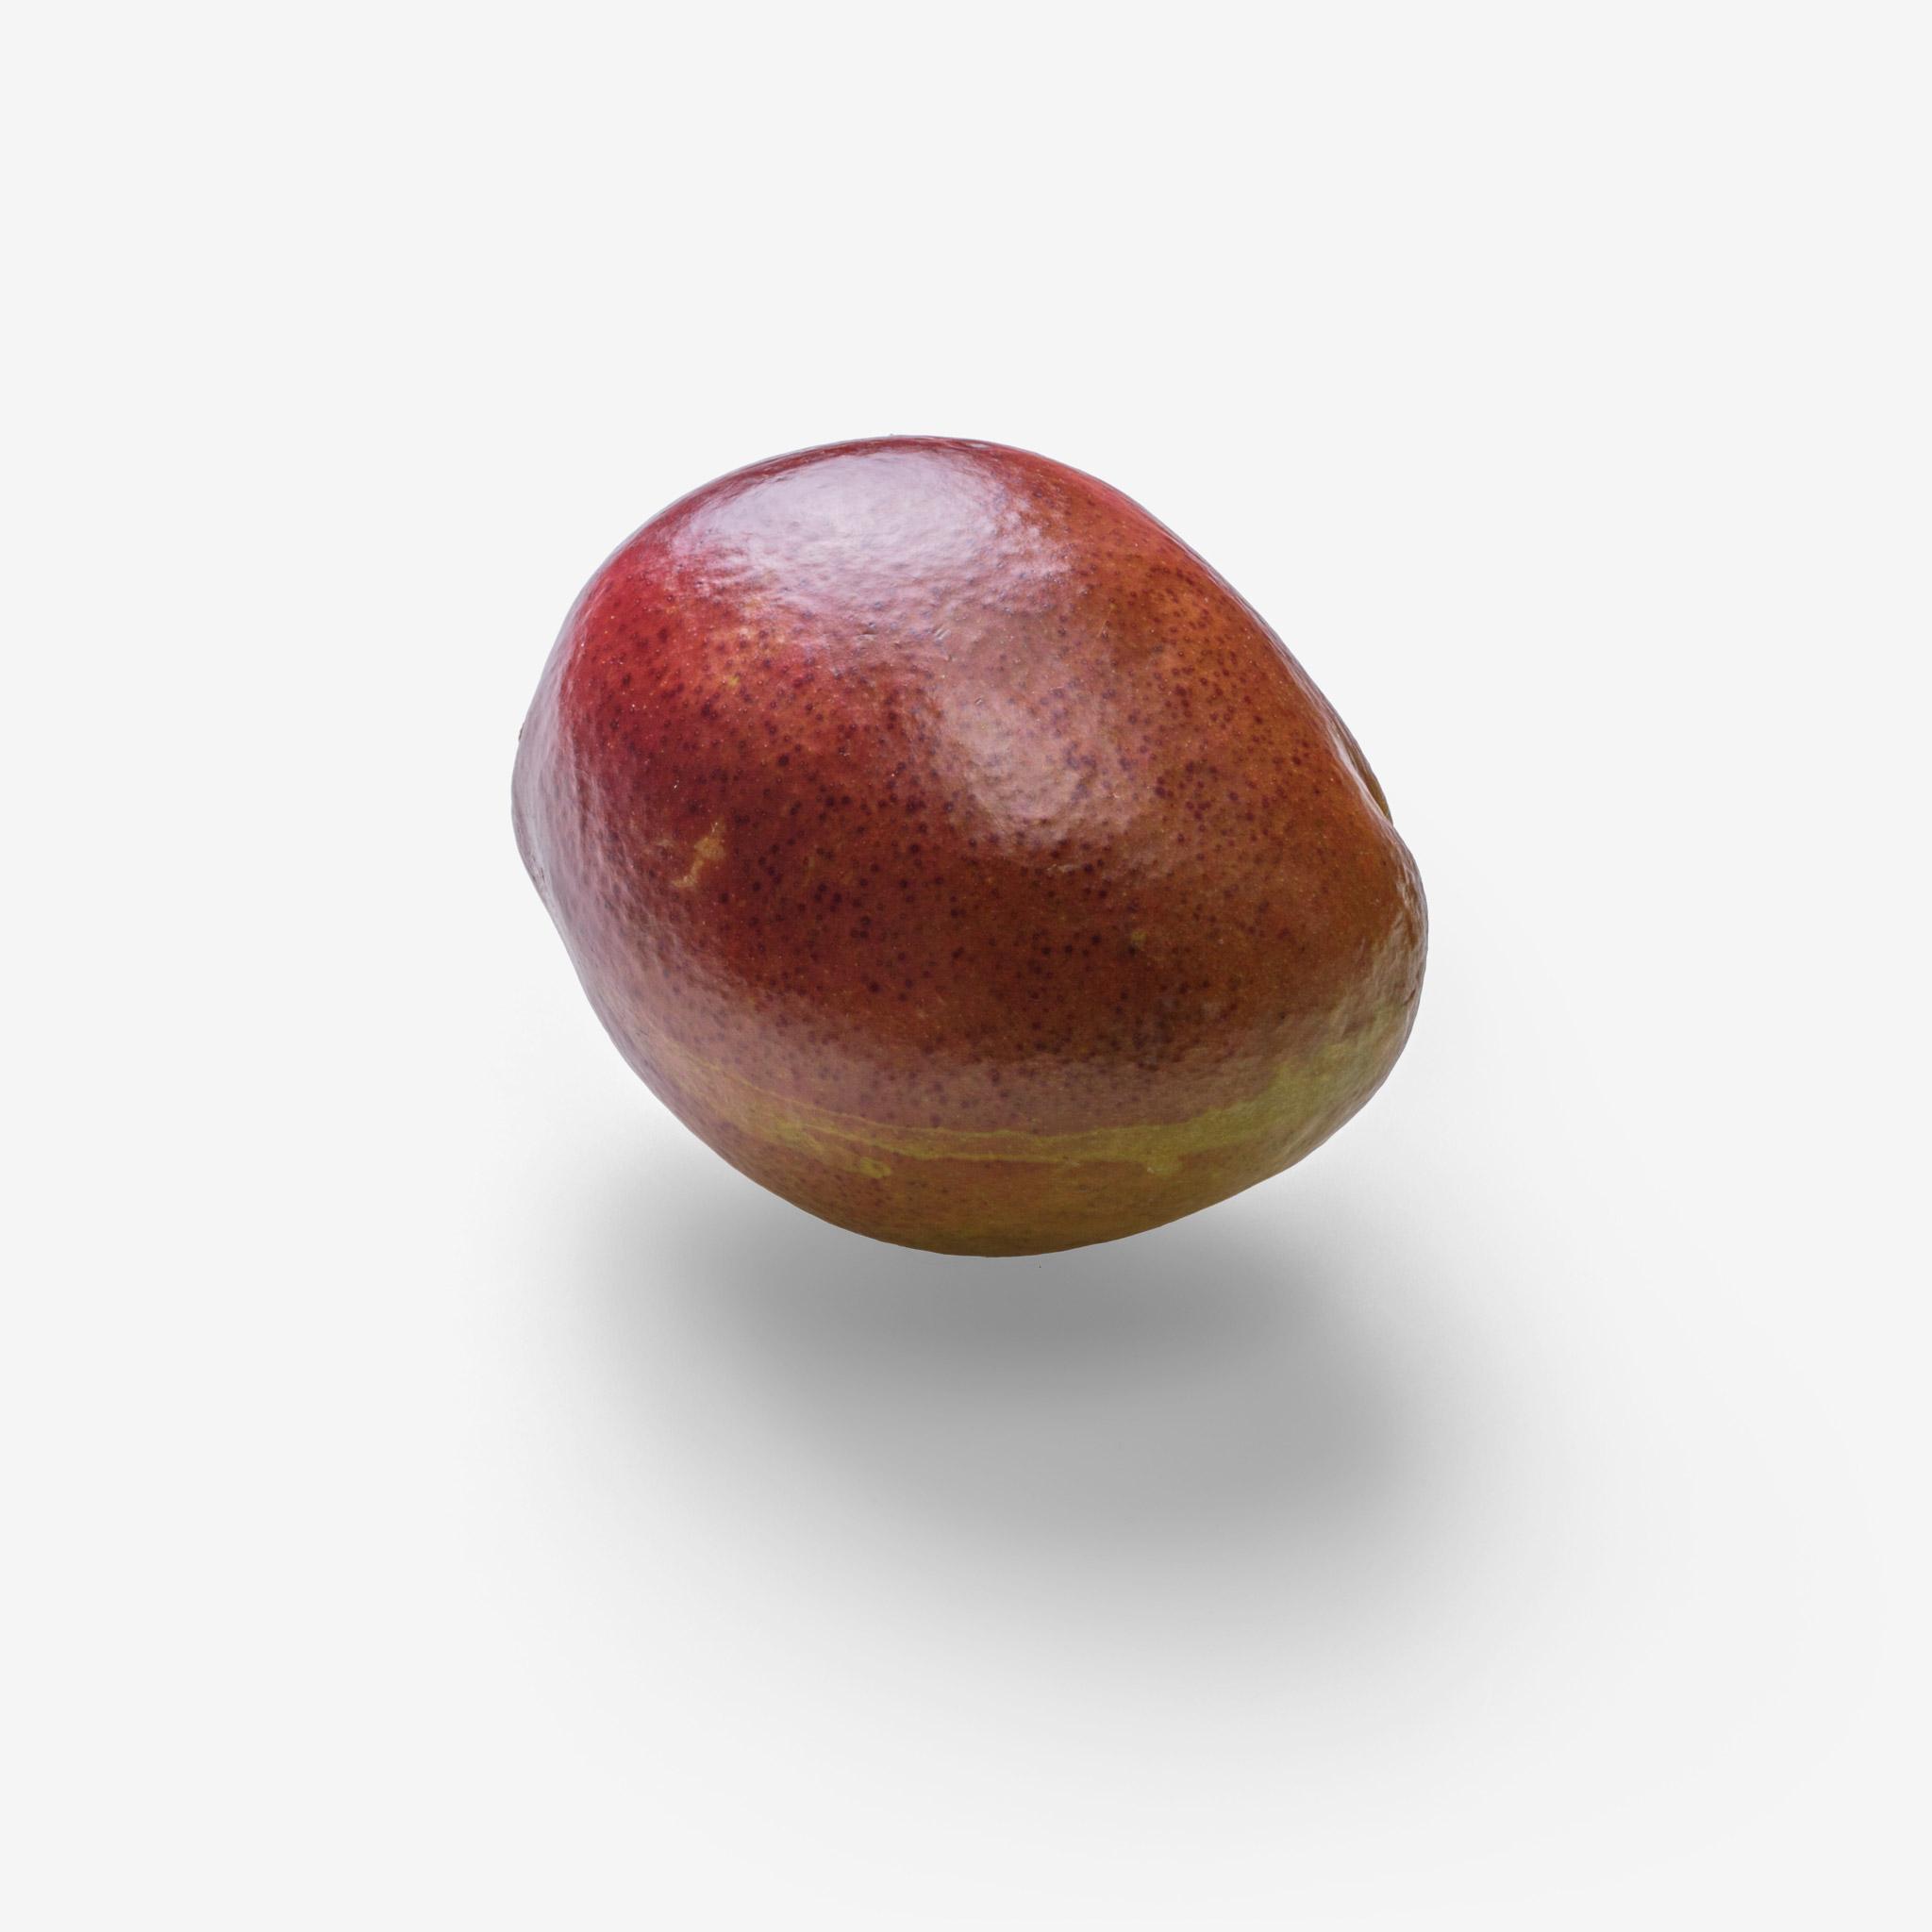 Mango image asset with transparent background